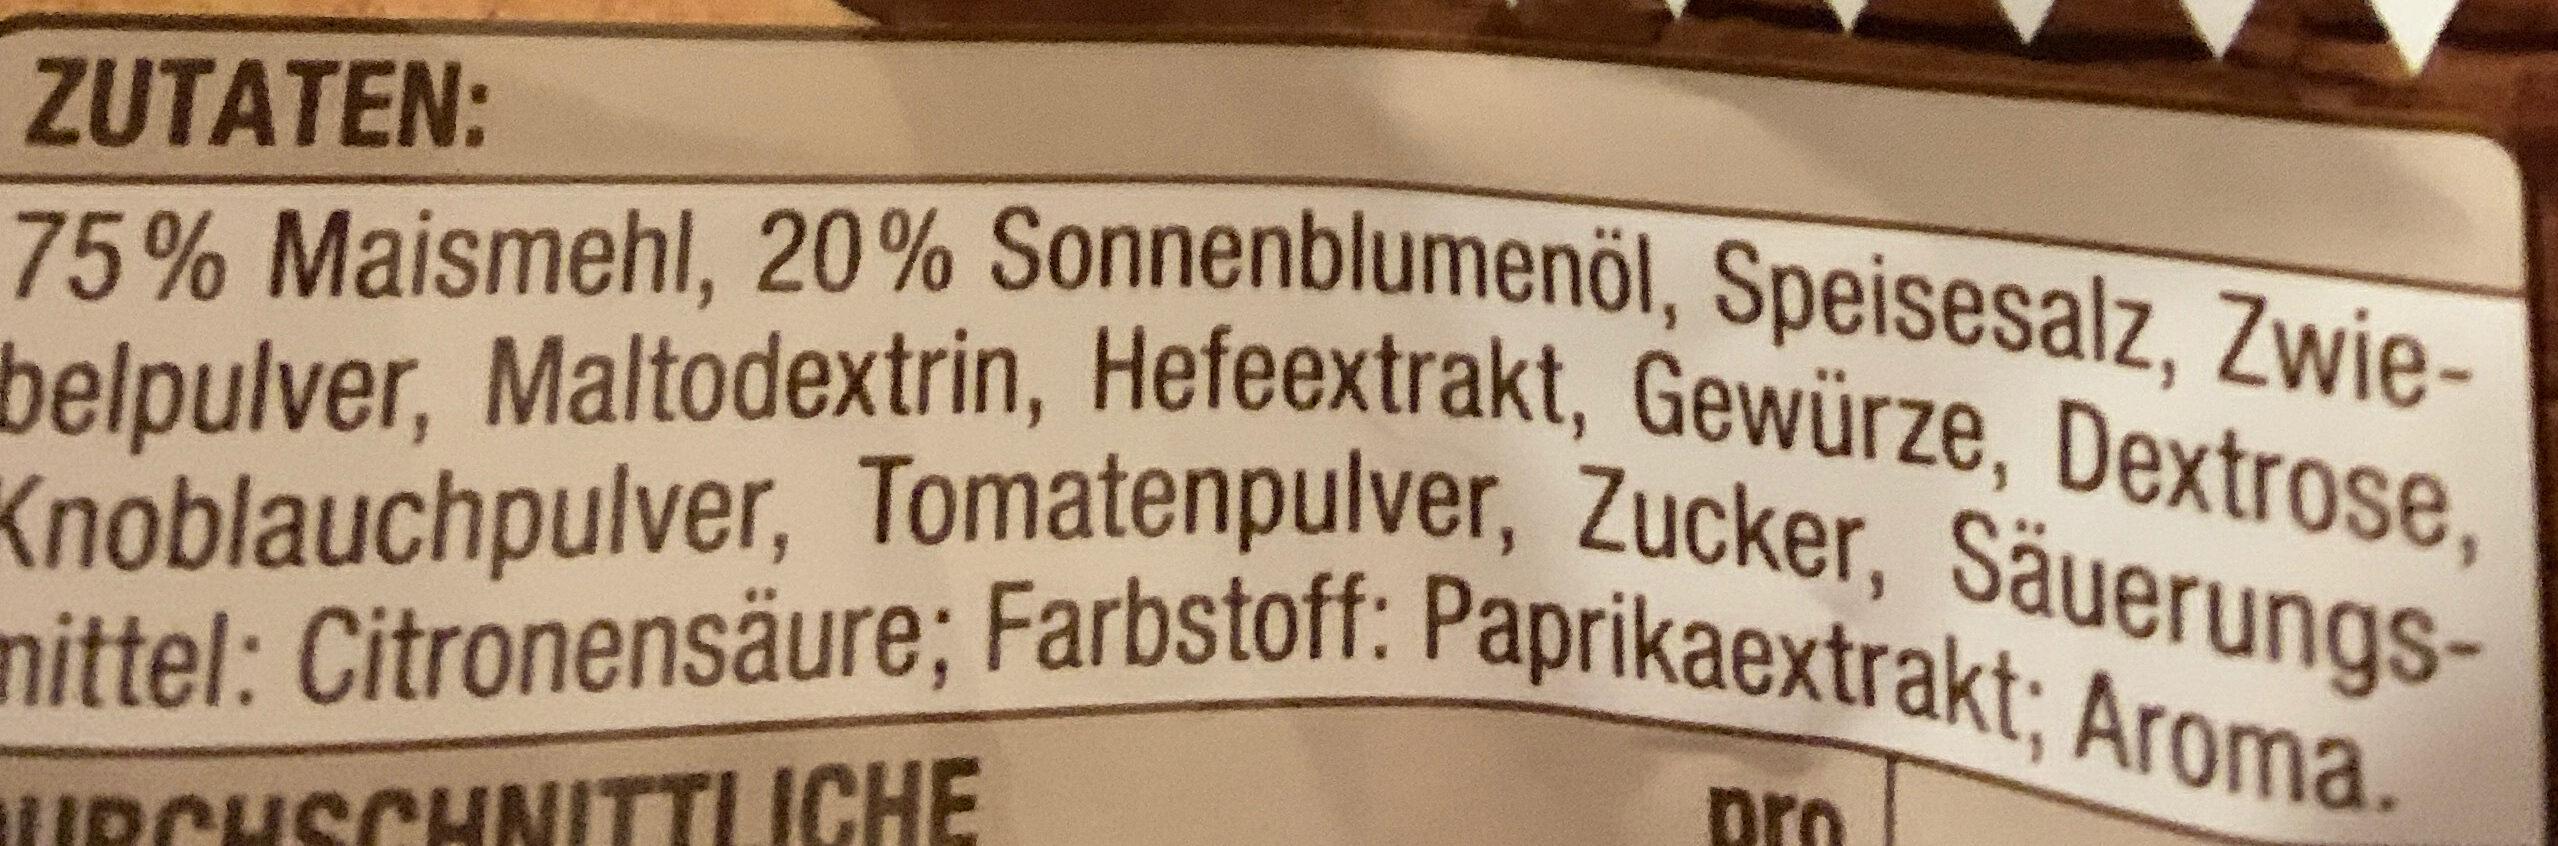 Tortilla Chips Hot Chili - Ingredients - de